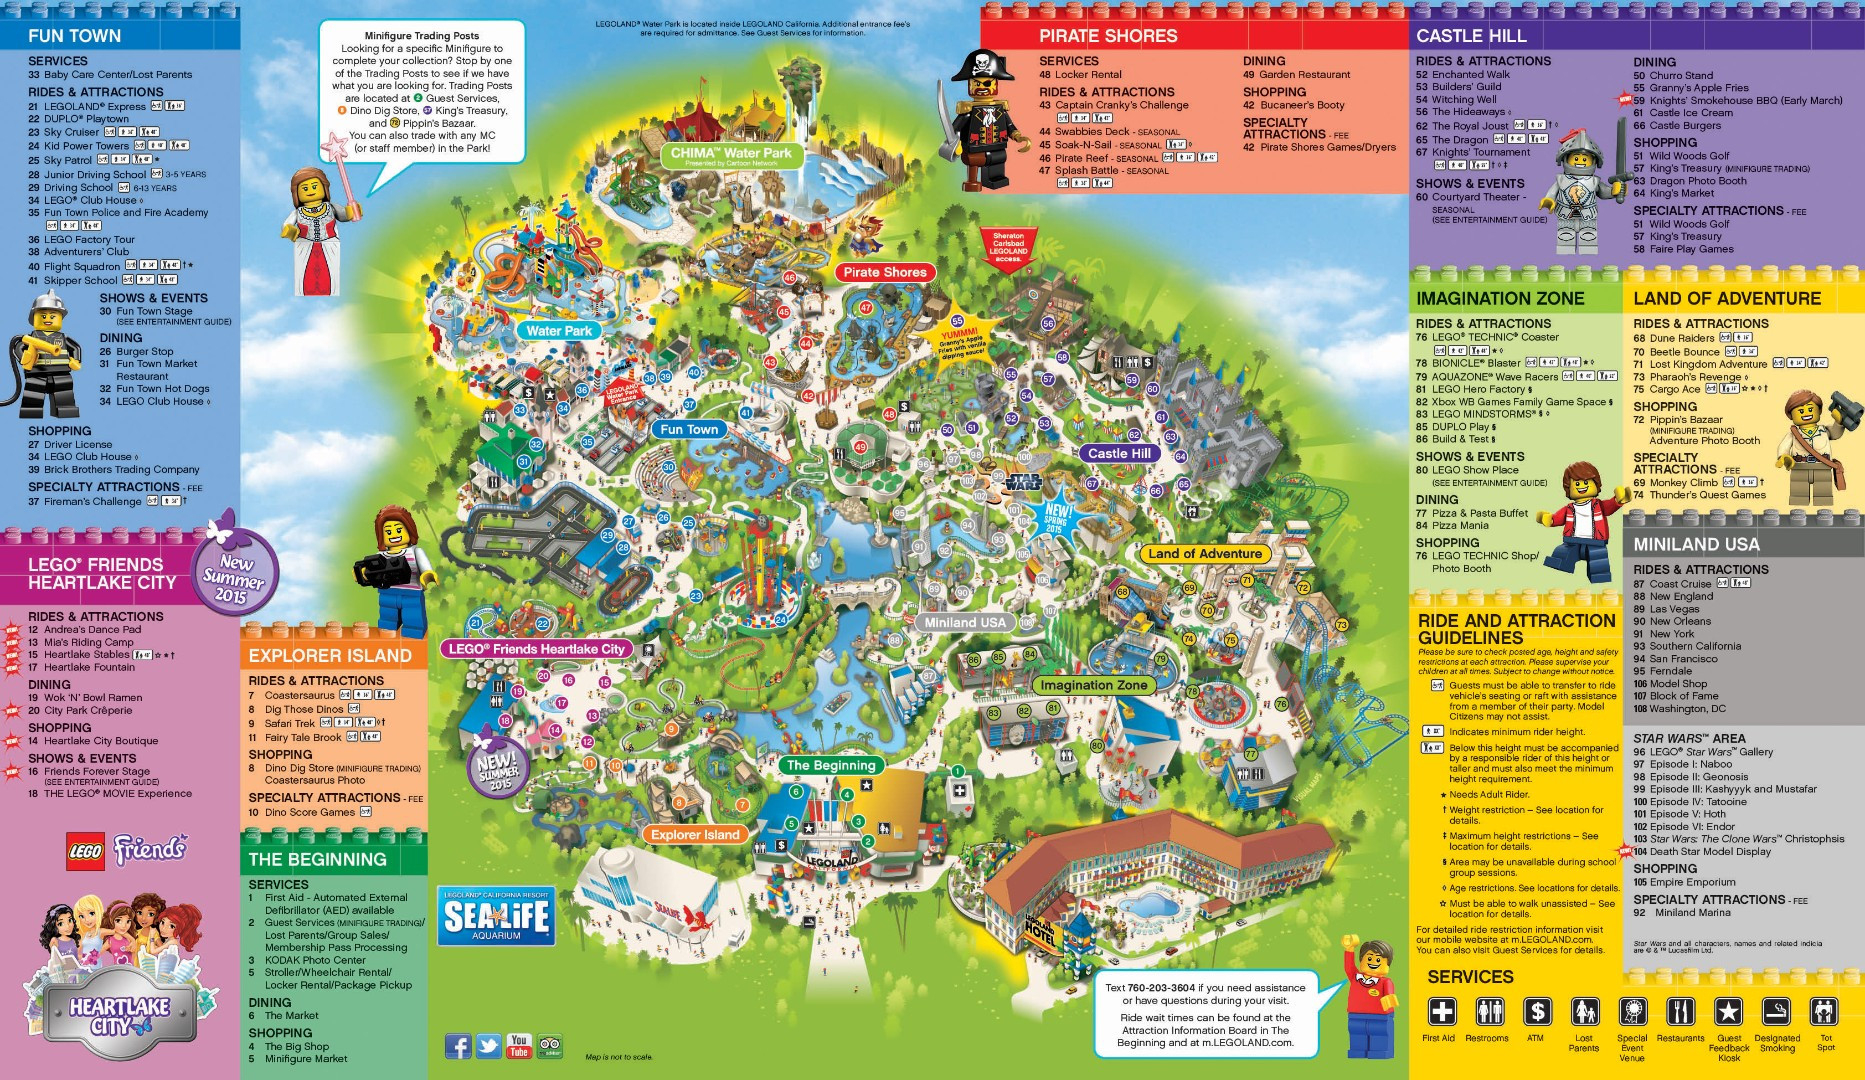 Universal Studios California Park Map Inspirational Legoland - Legoland Map California Pdf